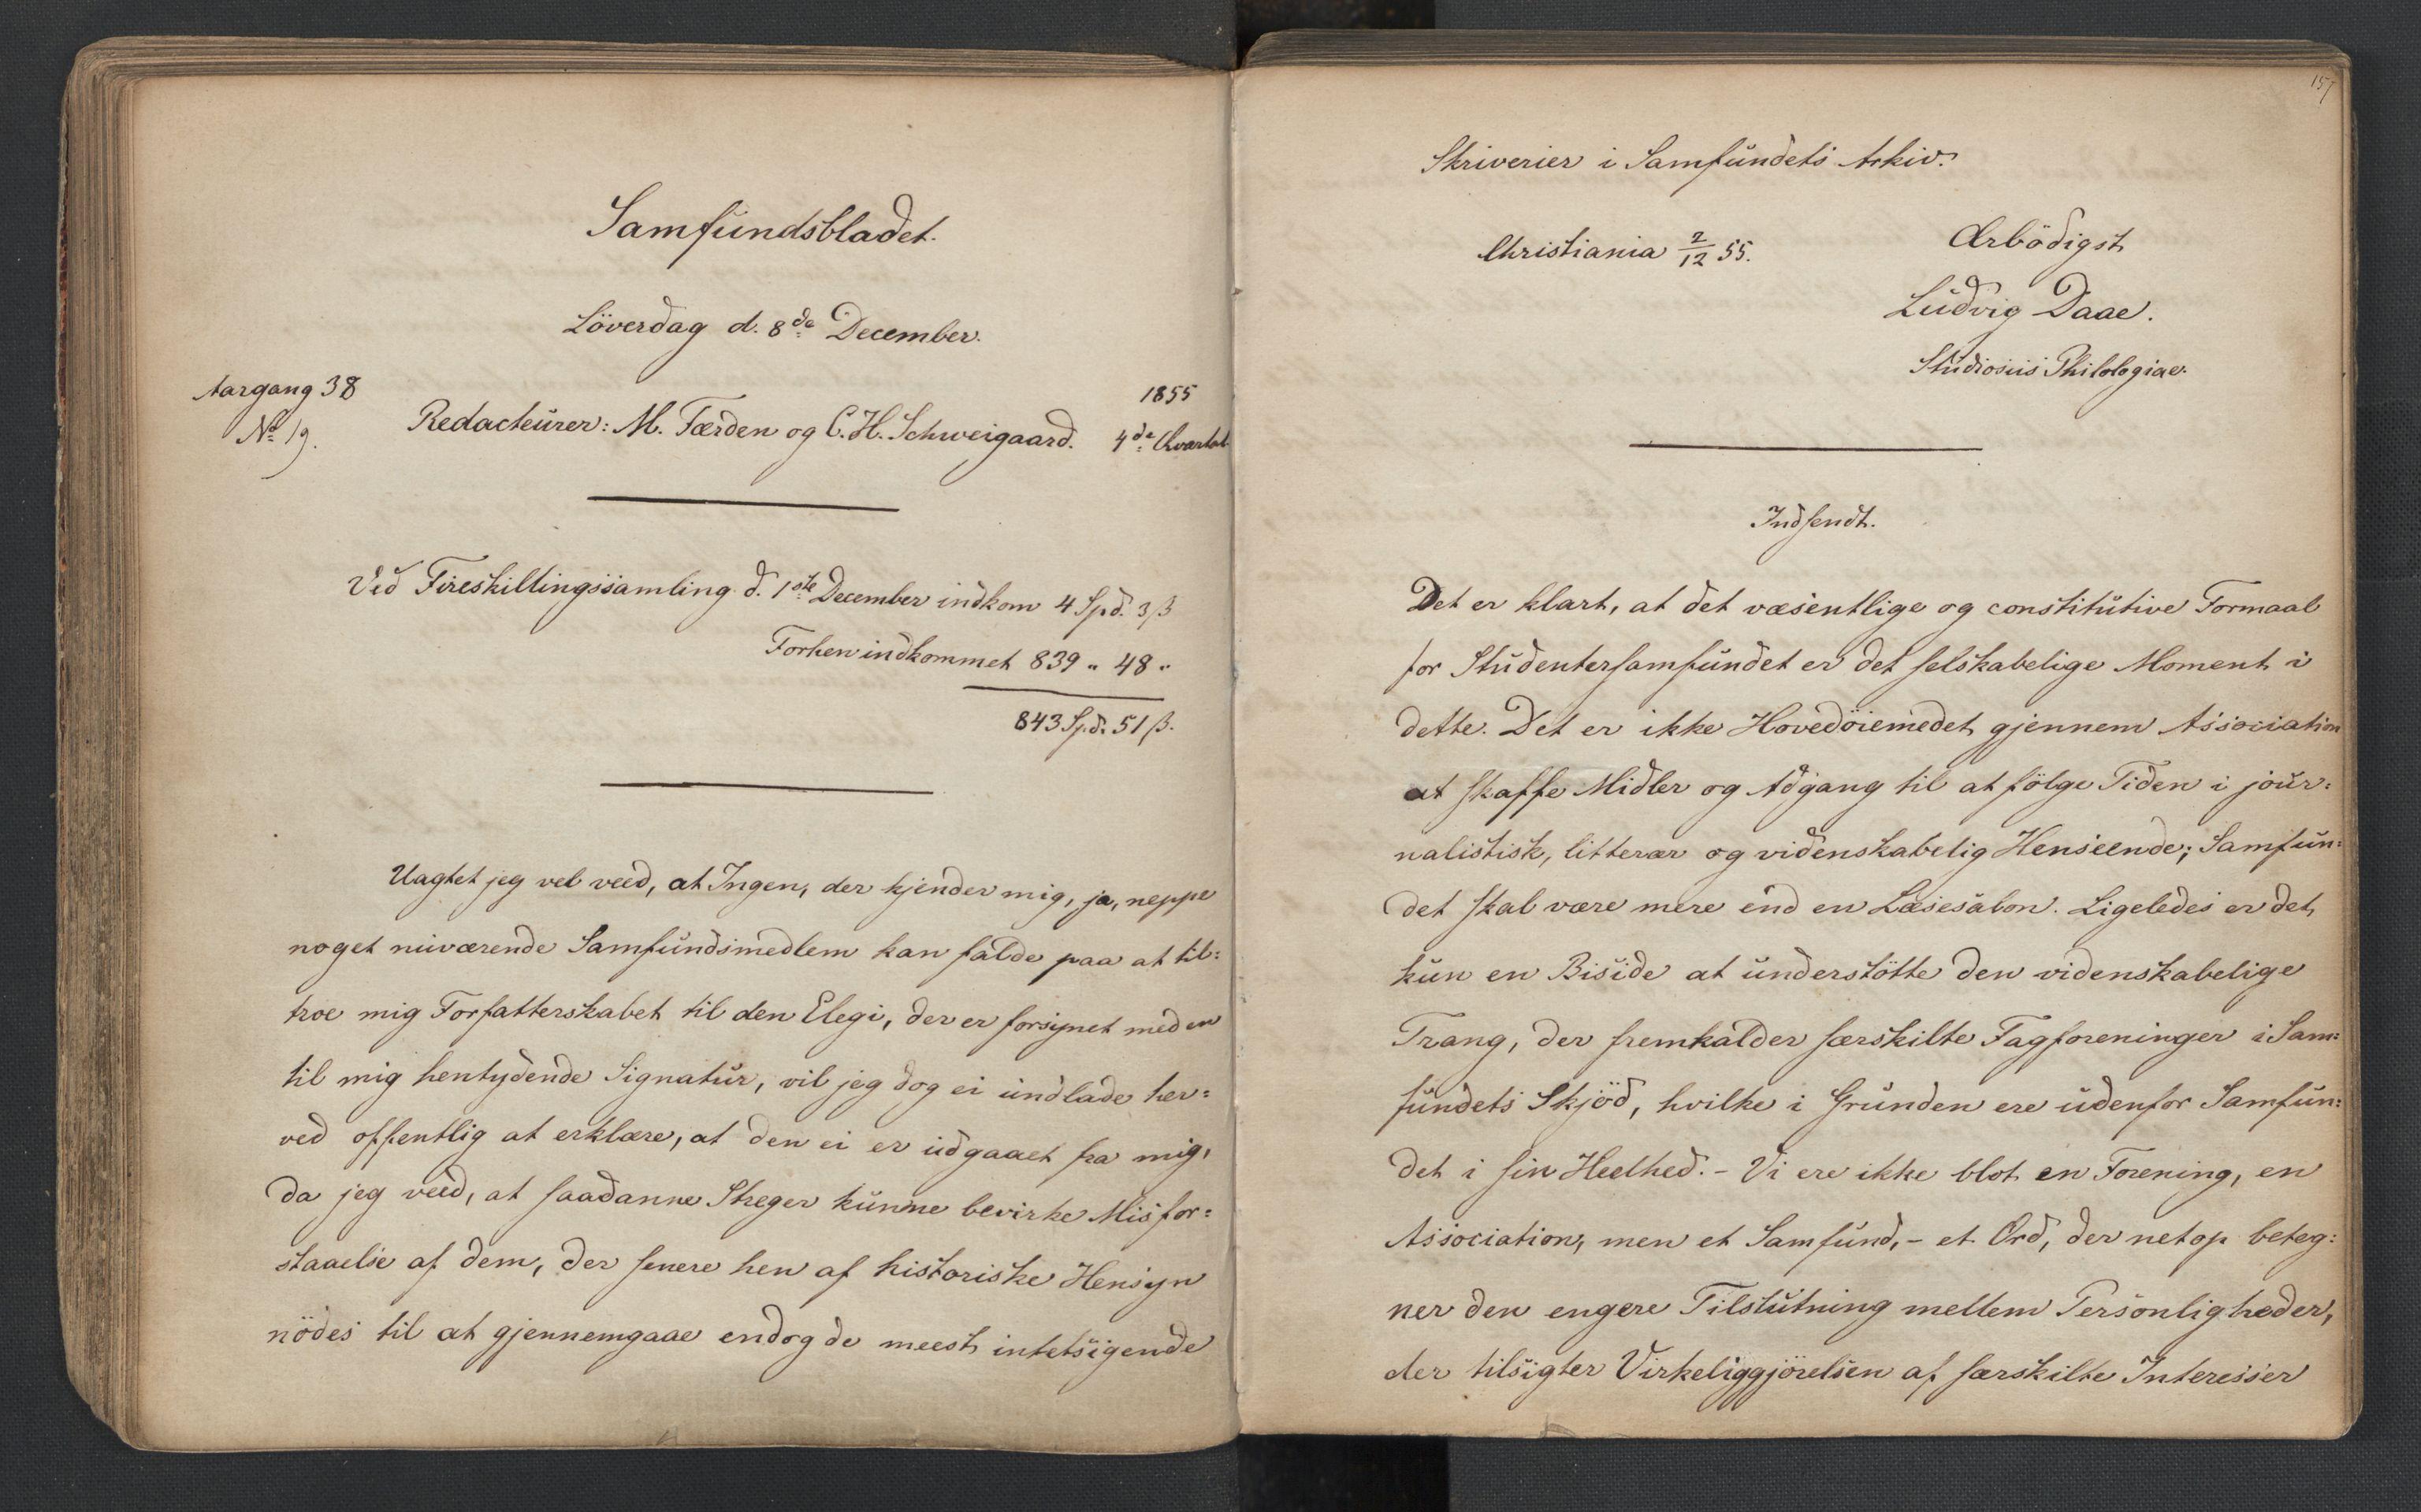 RA, Det Norske Studentersamfund, X/Xa/L0005, 1855-1856, s. 80